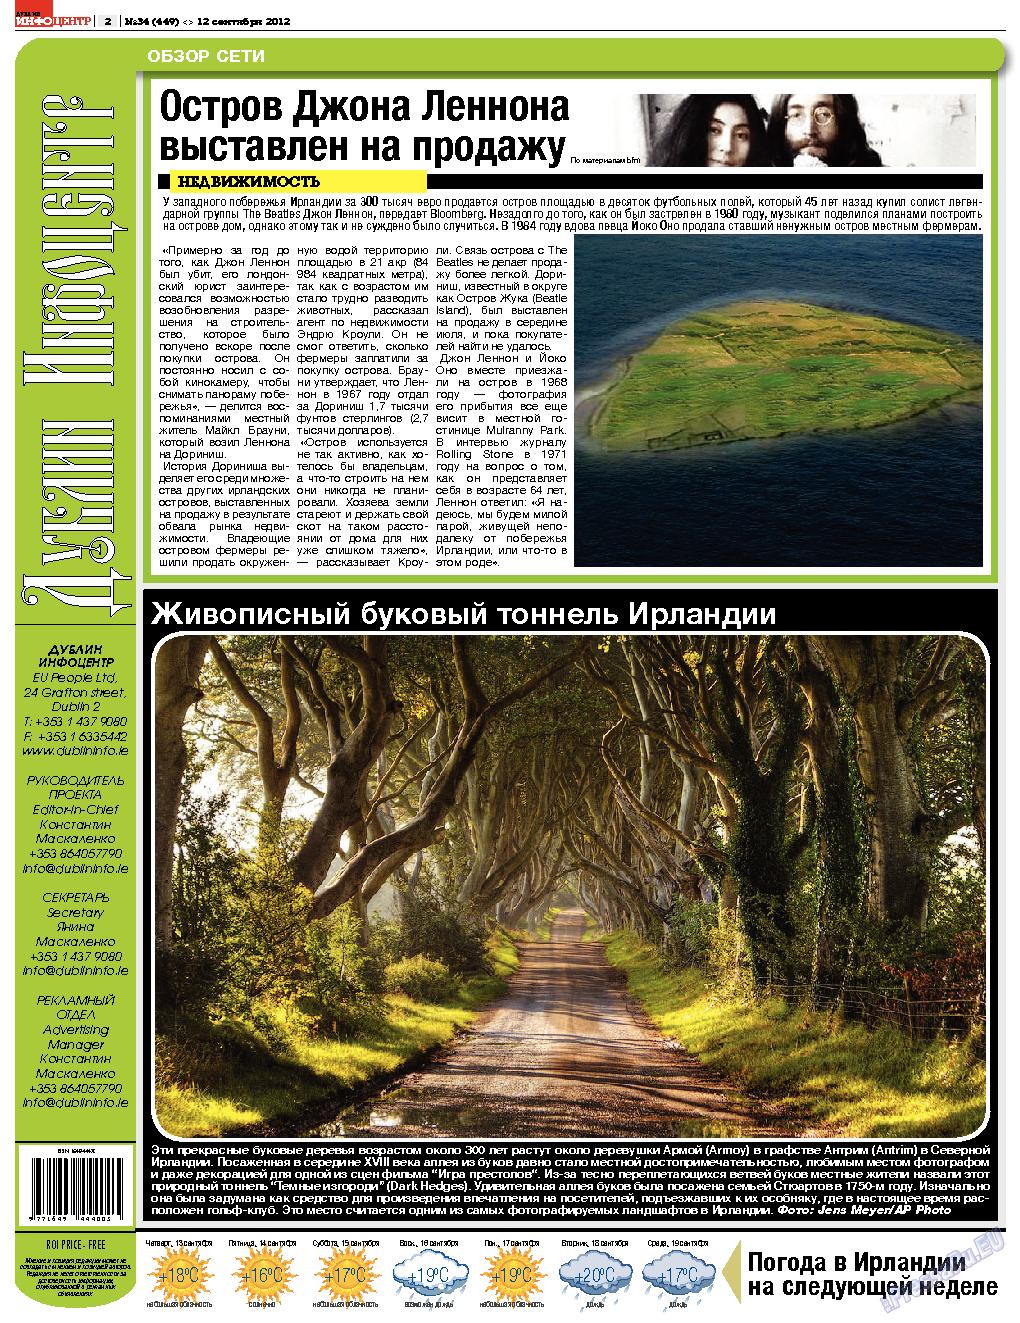 Дублин инфоцентр (газета). 2012 год, номер 34, стр. 2